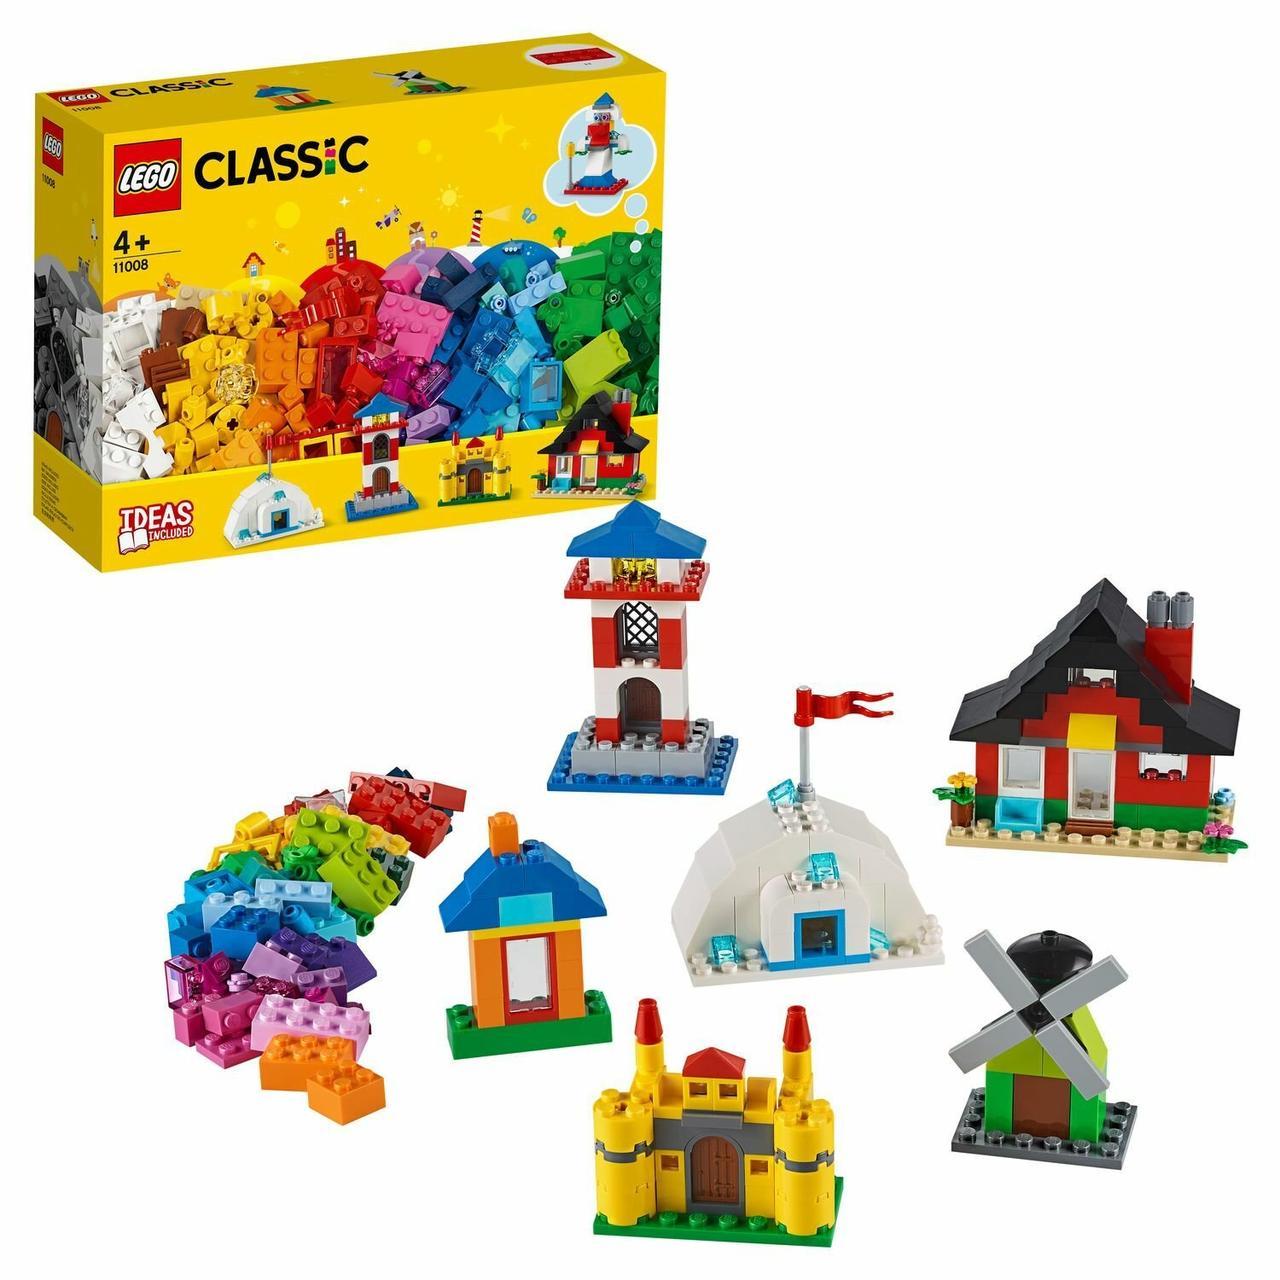 Конструктор LEGO Classic Кубики и домики 11008